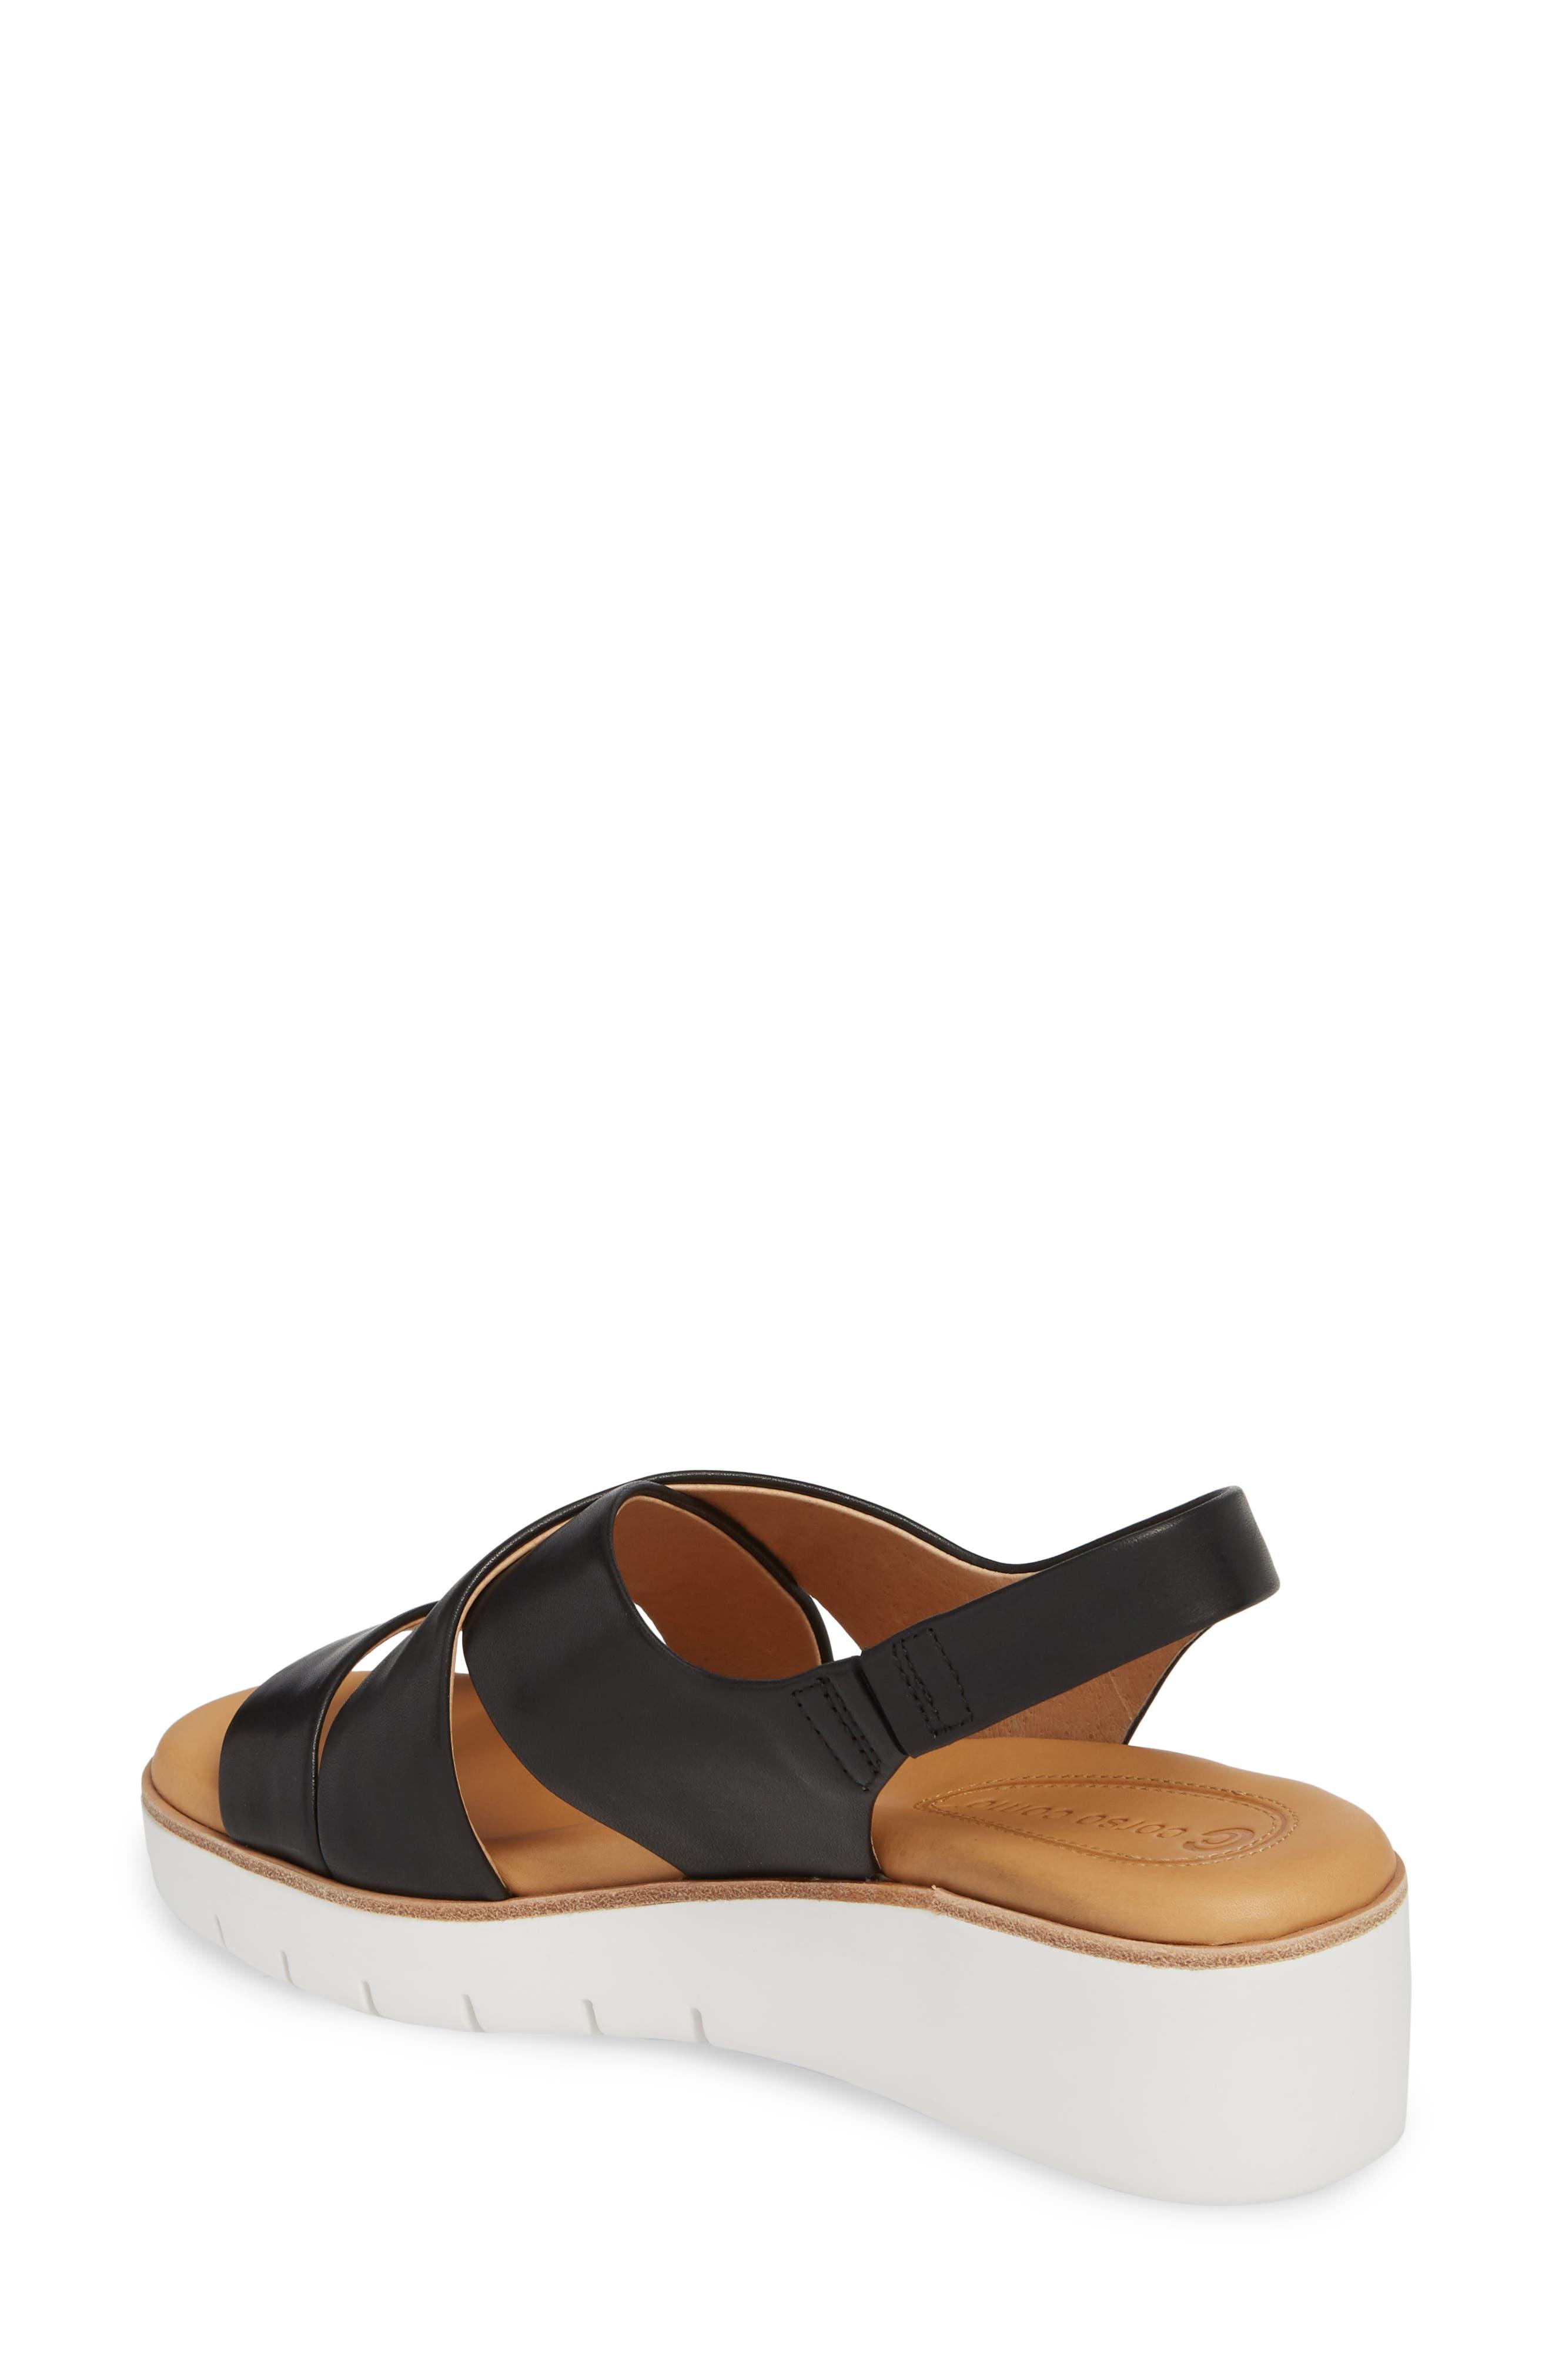 Brinney Wedge Sandal,                             Alternate thumbnail 2, color,                             BLACK LEATHER